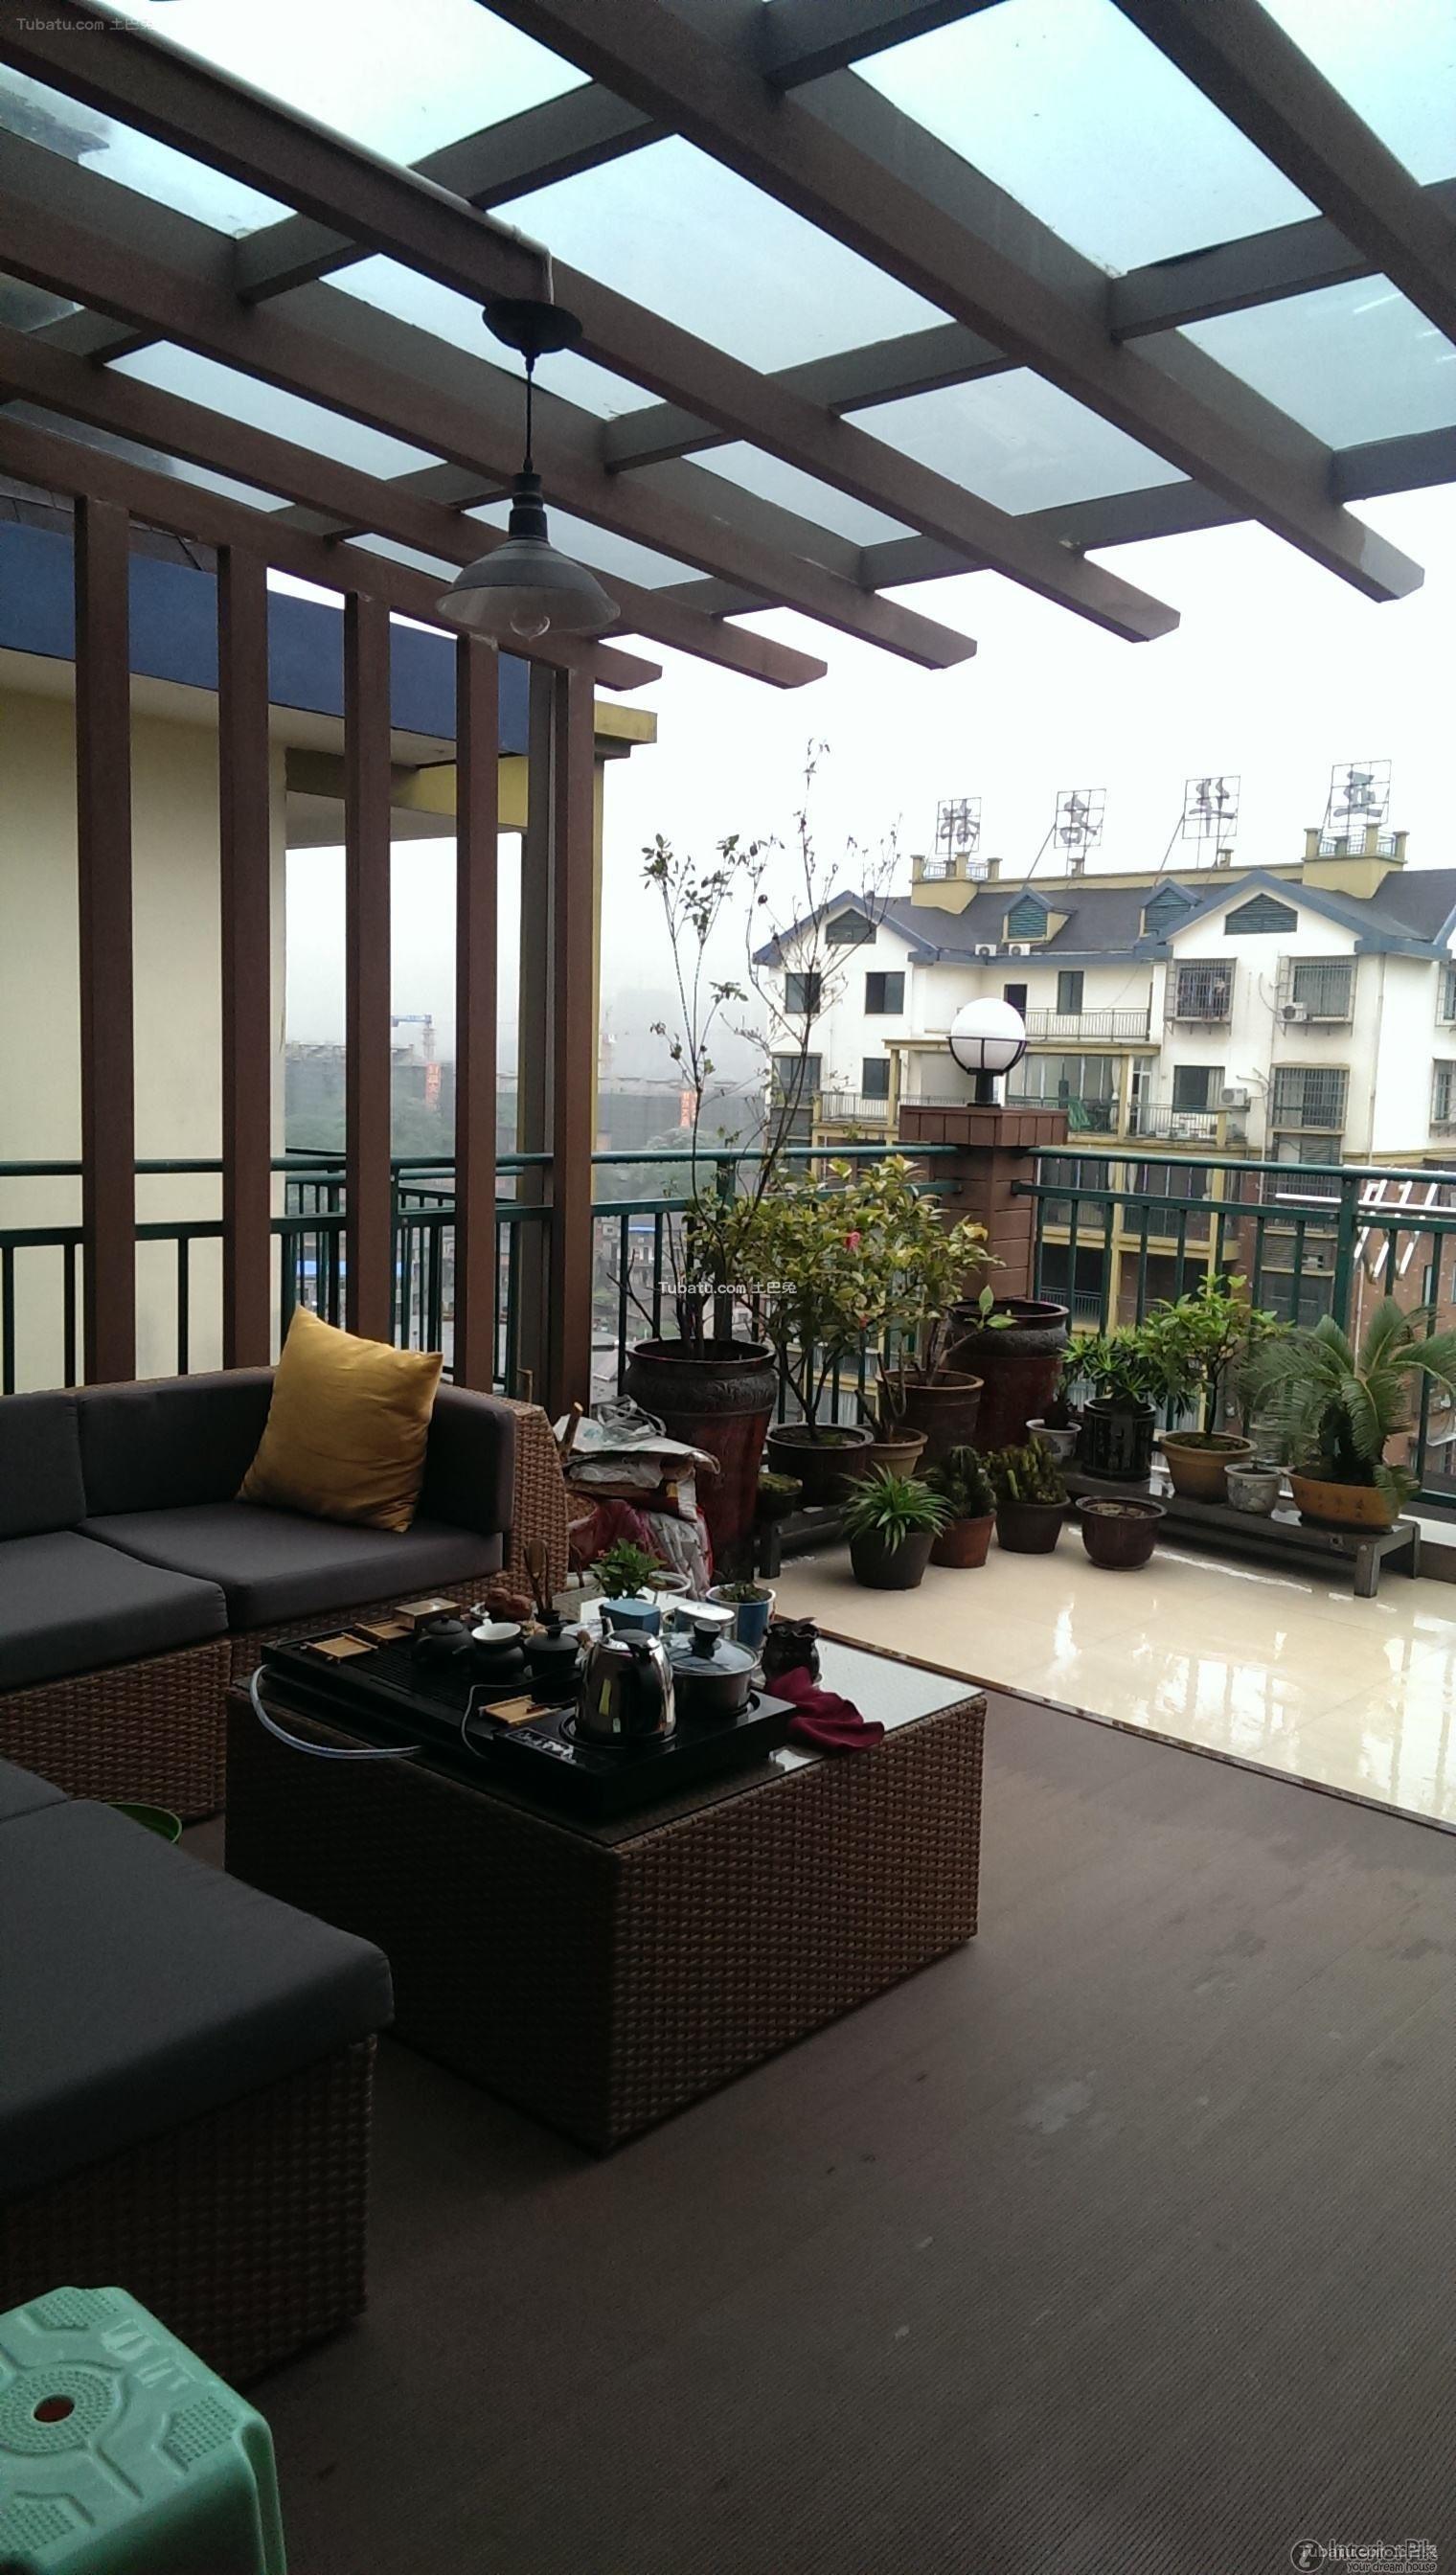 Villa Semi Open-air Balcony On The Second Floor Design